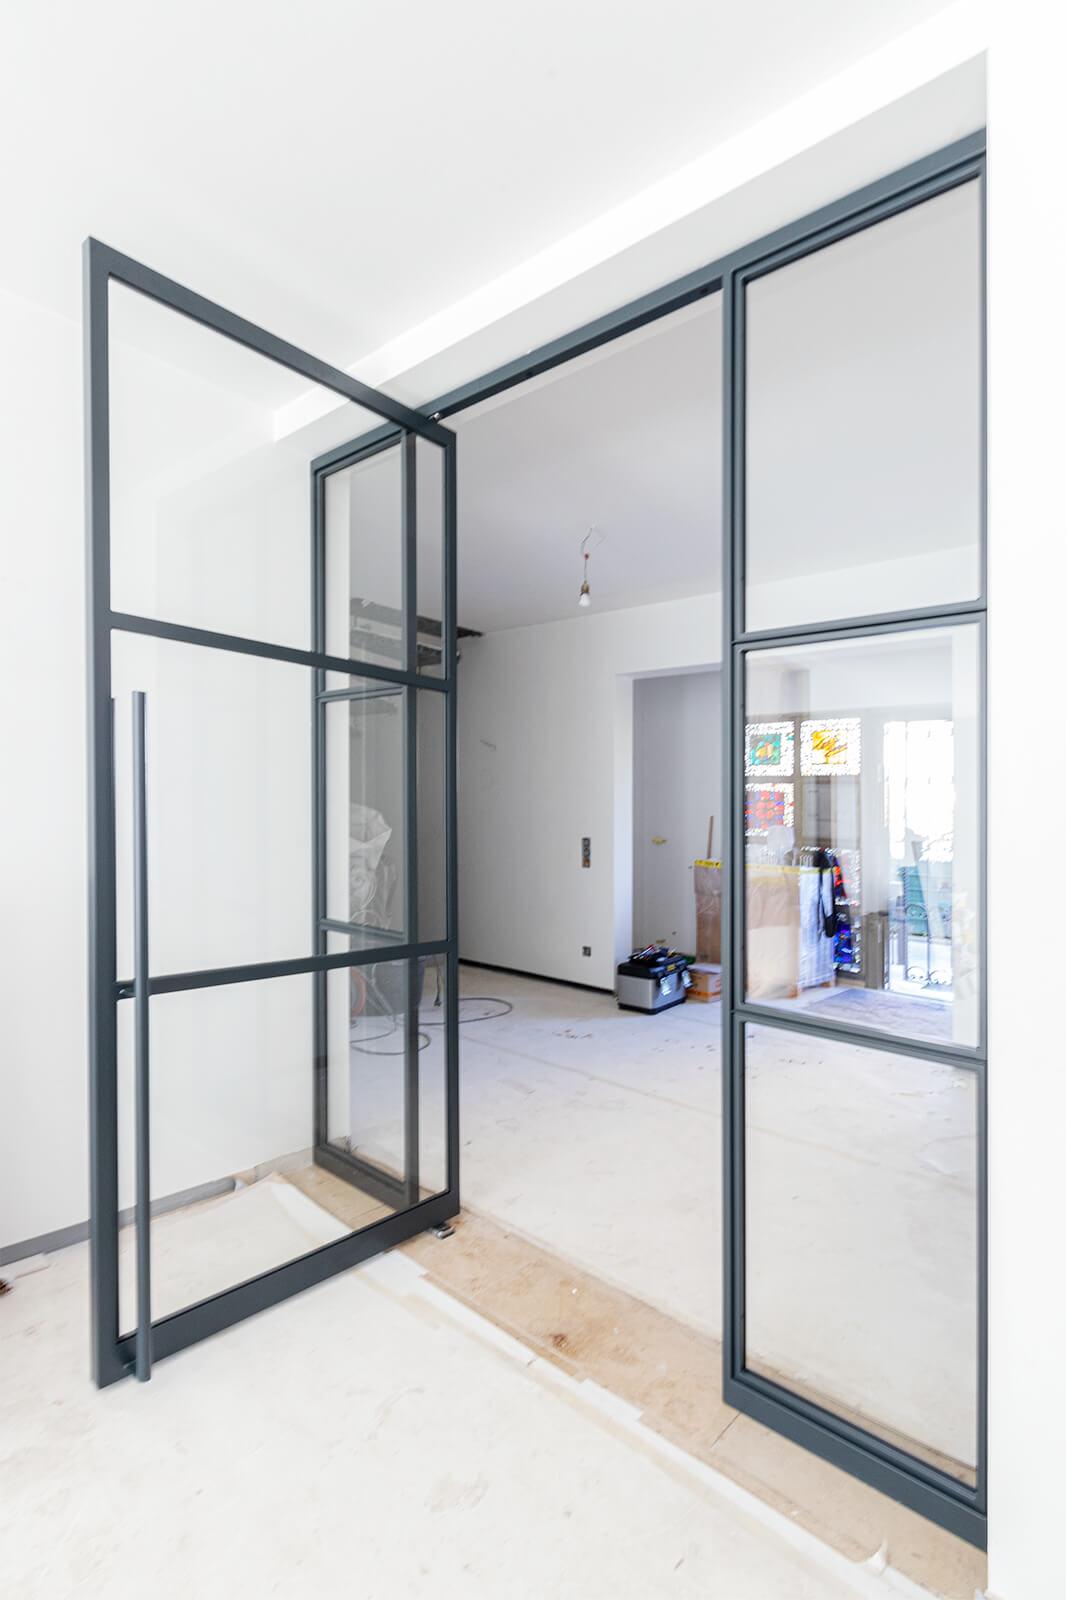 N51E12 Stahl Loft Tür, Schwingtür, Pivottür, Lofttür, Stahltür, Raumtrenner, Windfang, Glastrennwand